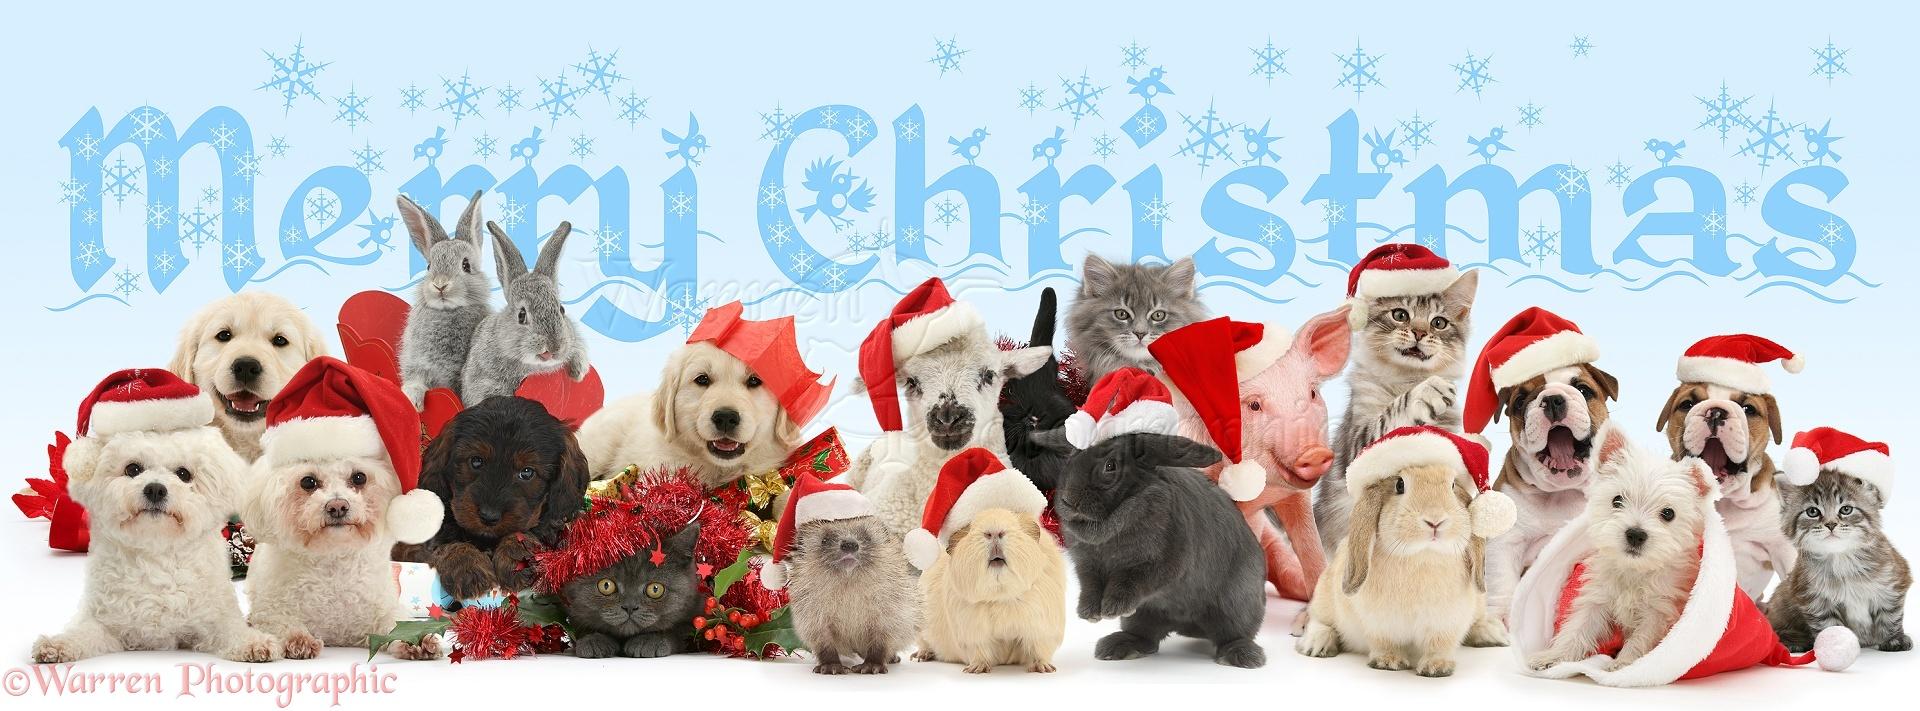 Merry Christmas Puppies.Pets Merry Christmas Pets Wearing Santa Hats Photo Wp42640